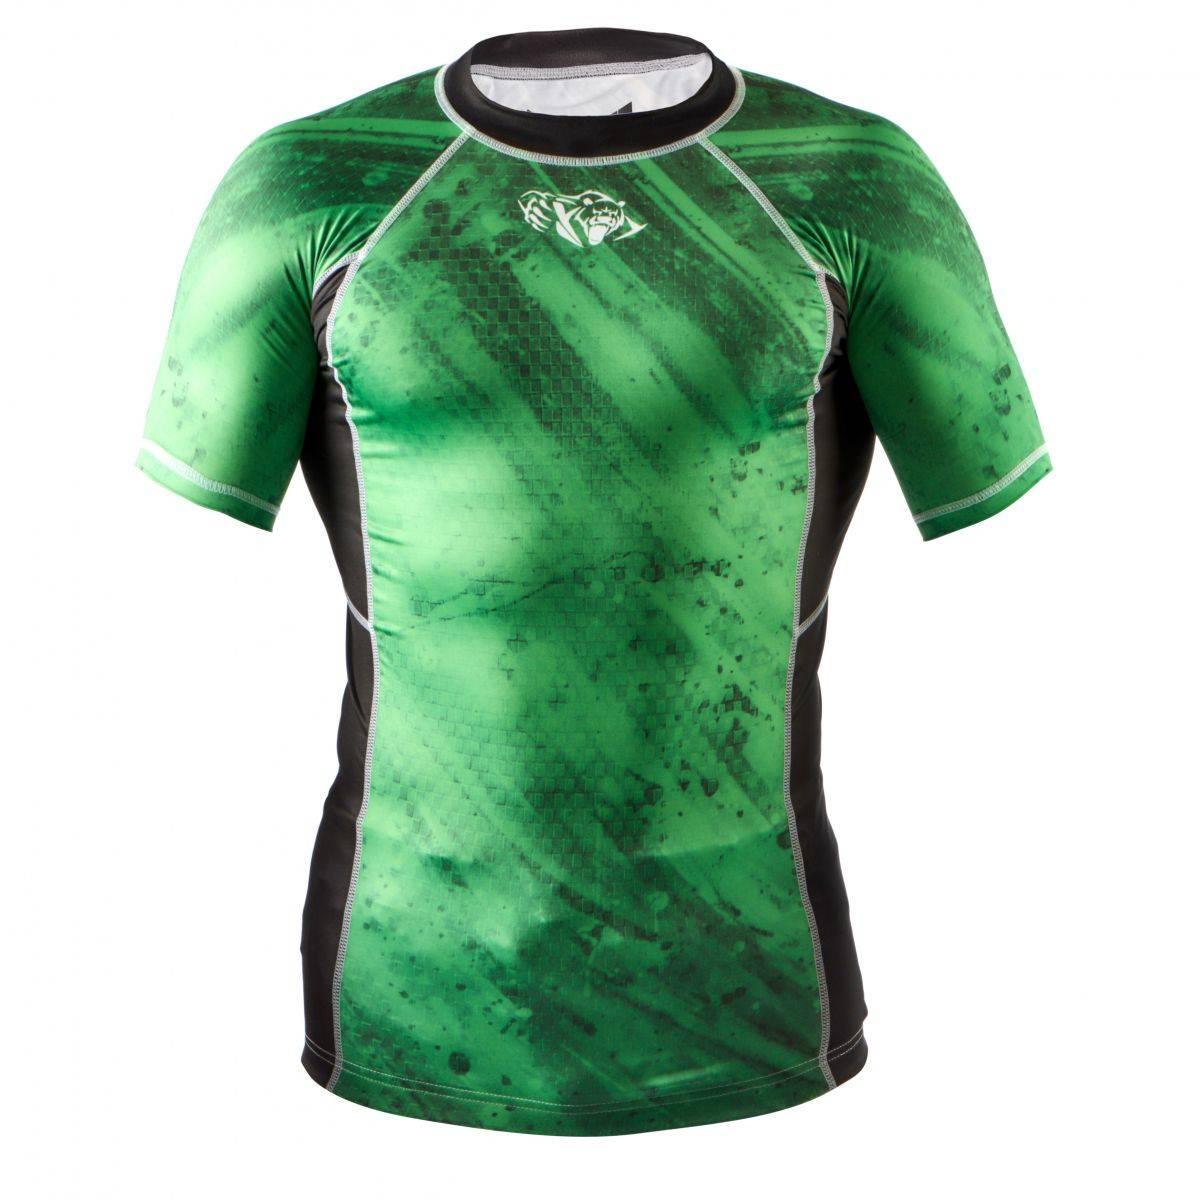 Компрессионная футболка Peresvit Beast Silver Force Green-S